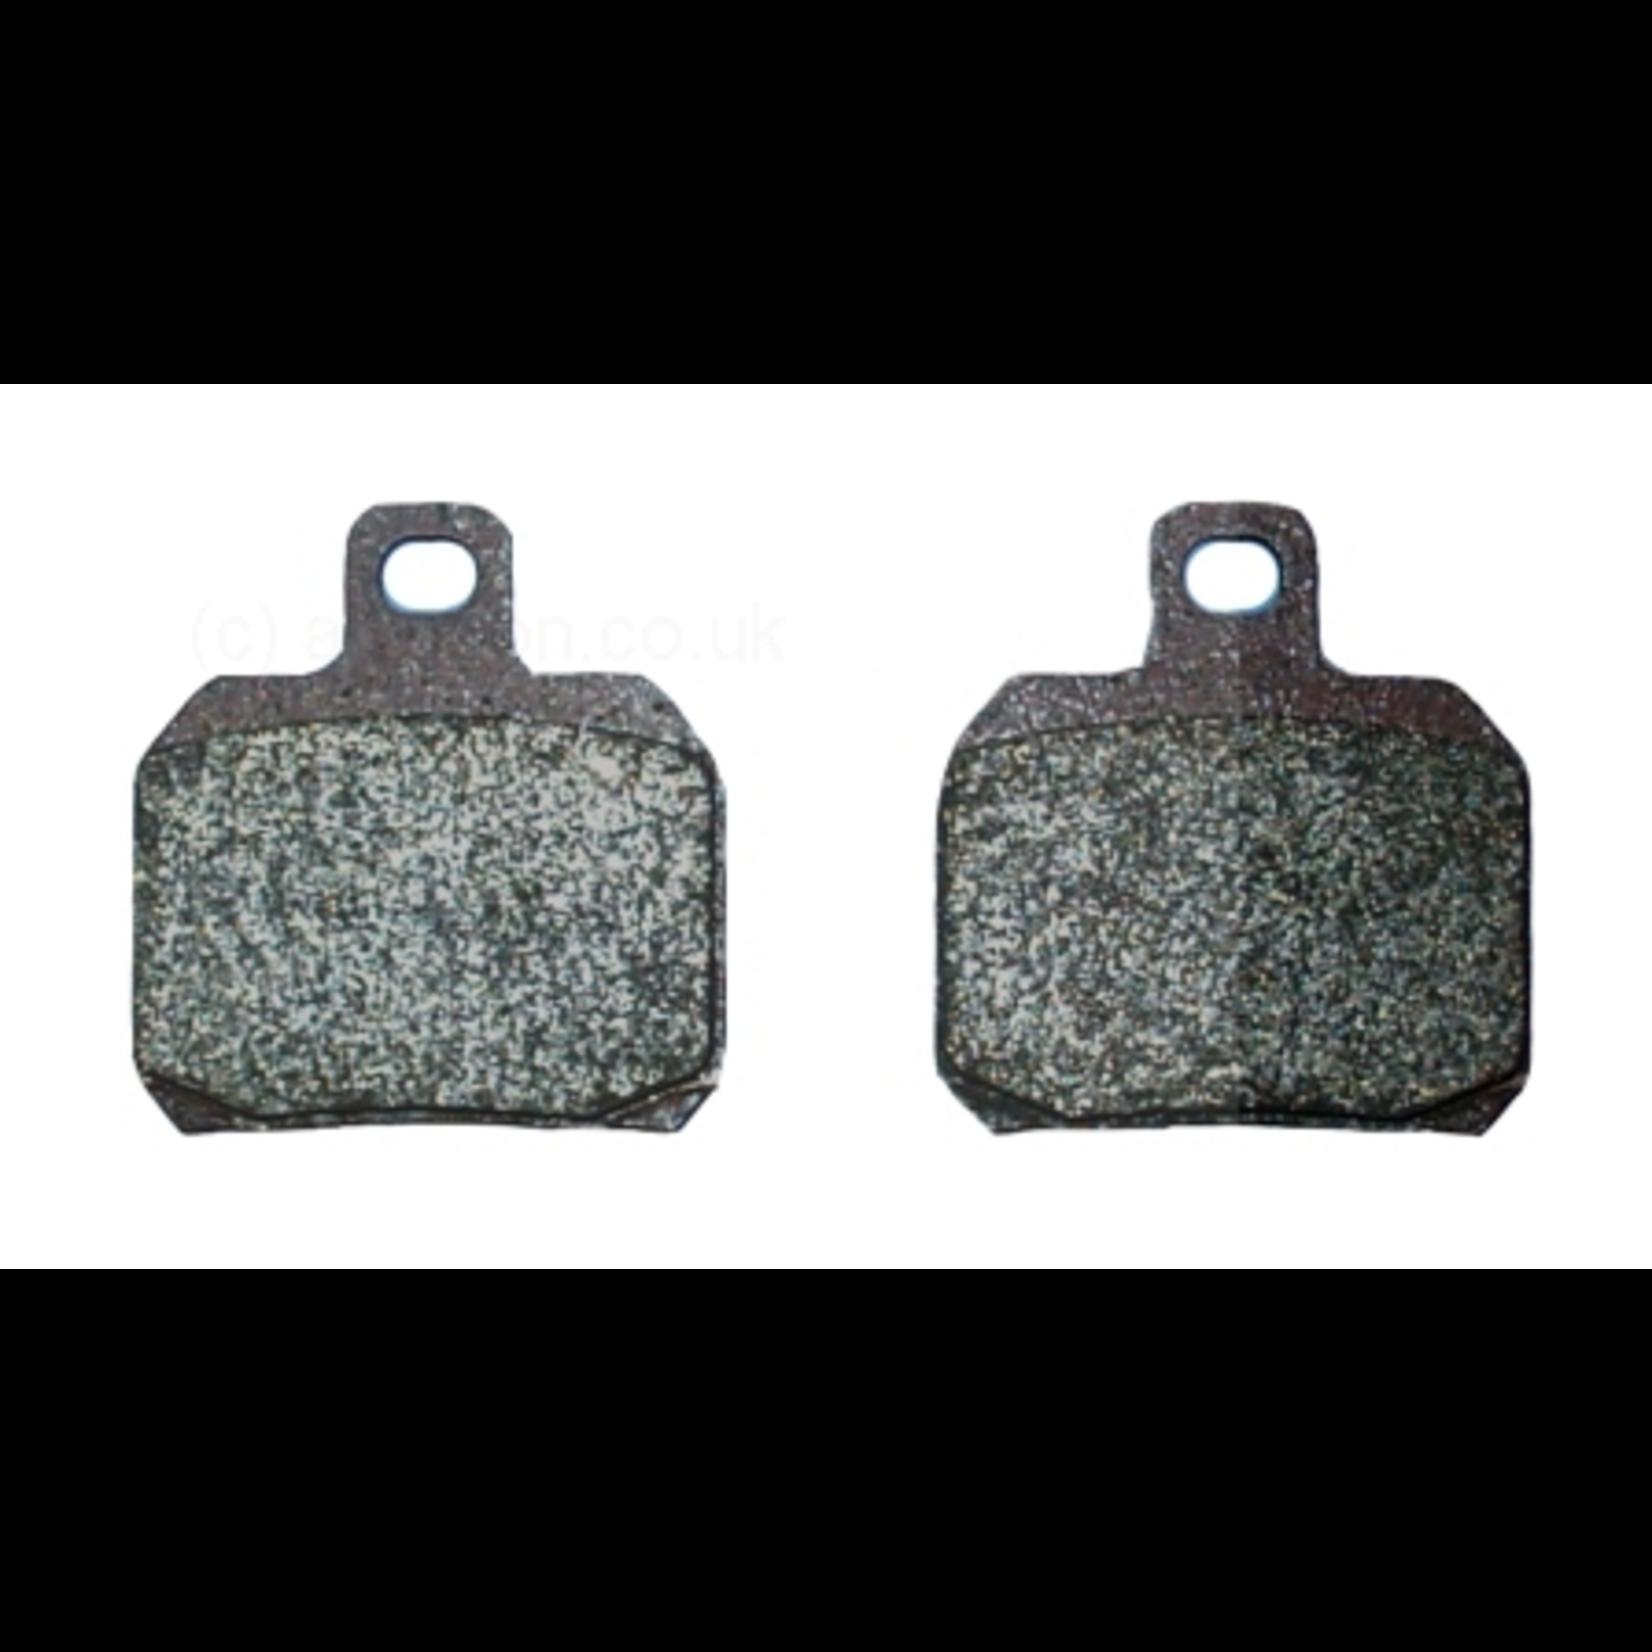 Parts Brake Pads, BV500 Front and Rear